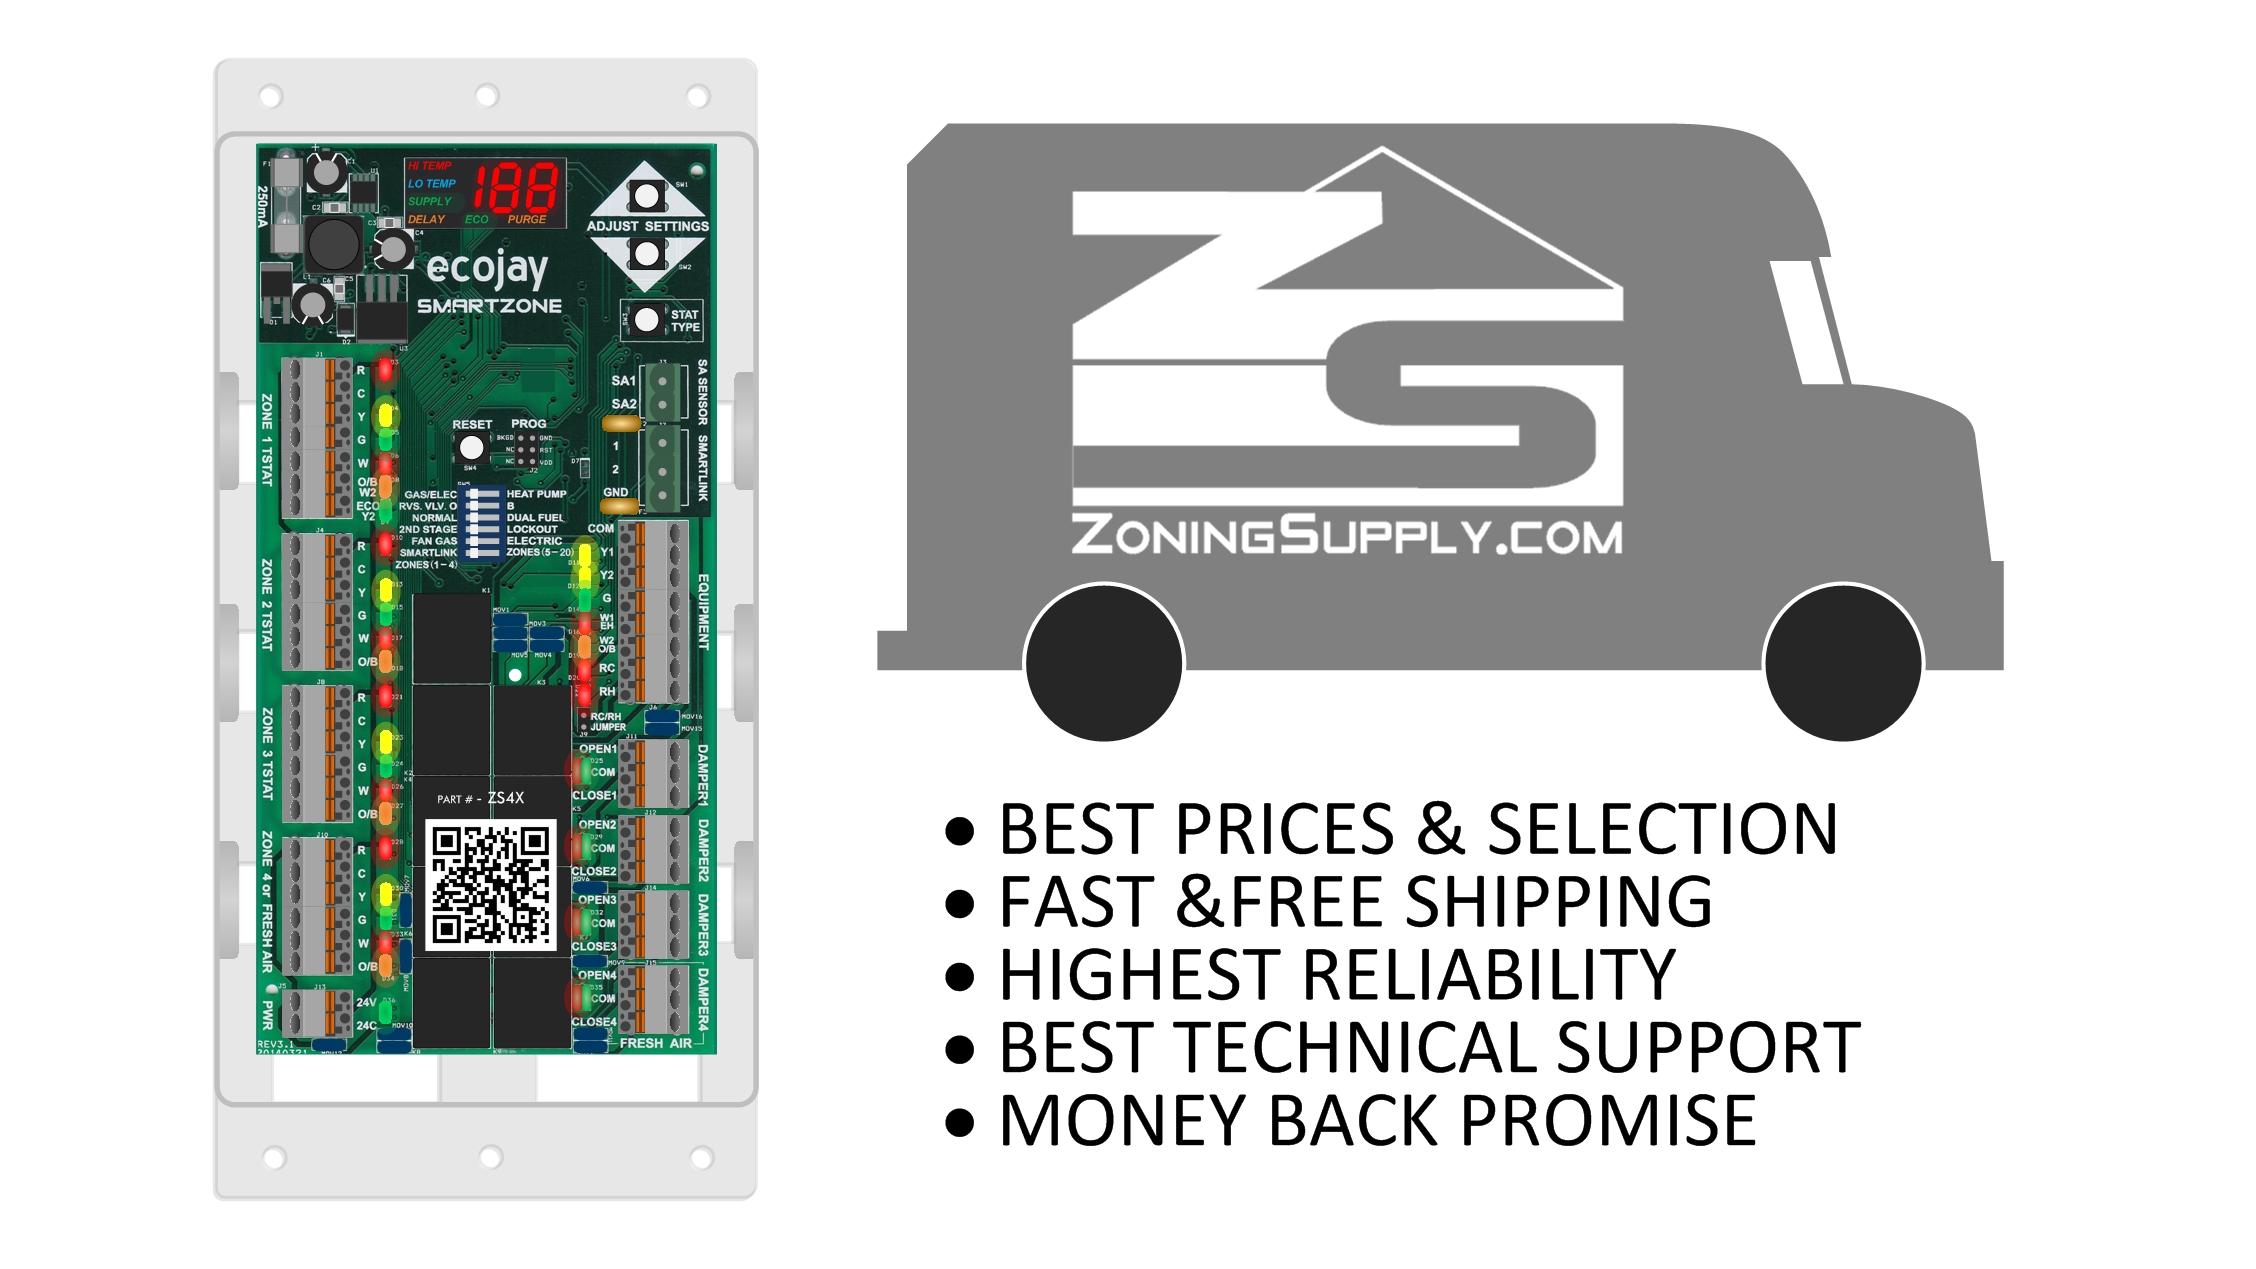 09 smartzone zoning supply banner.jpg